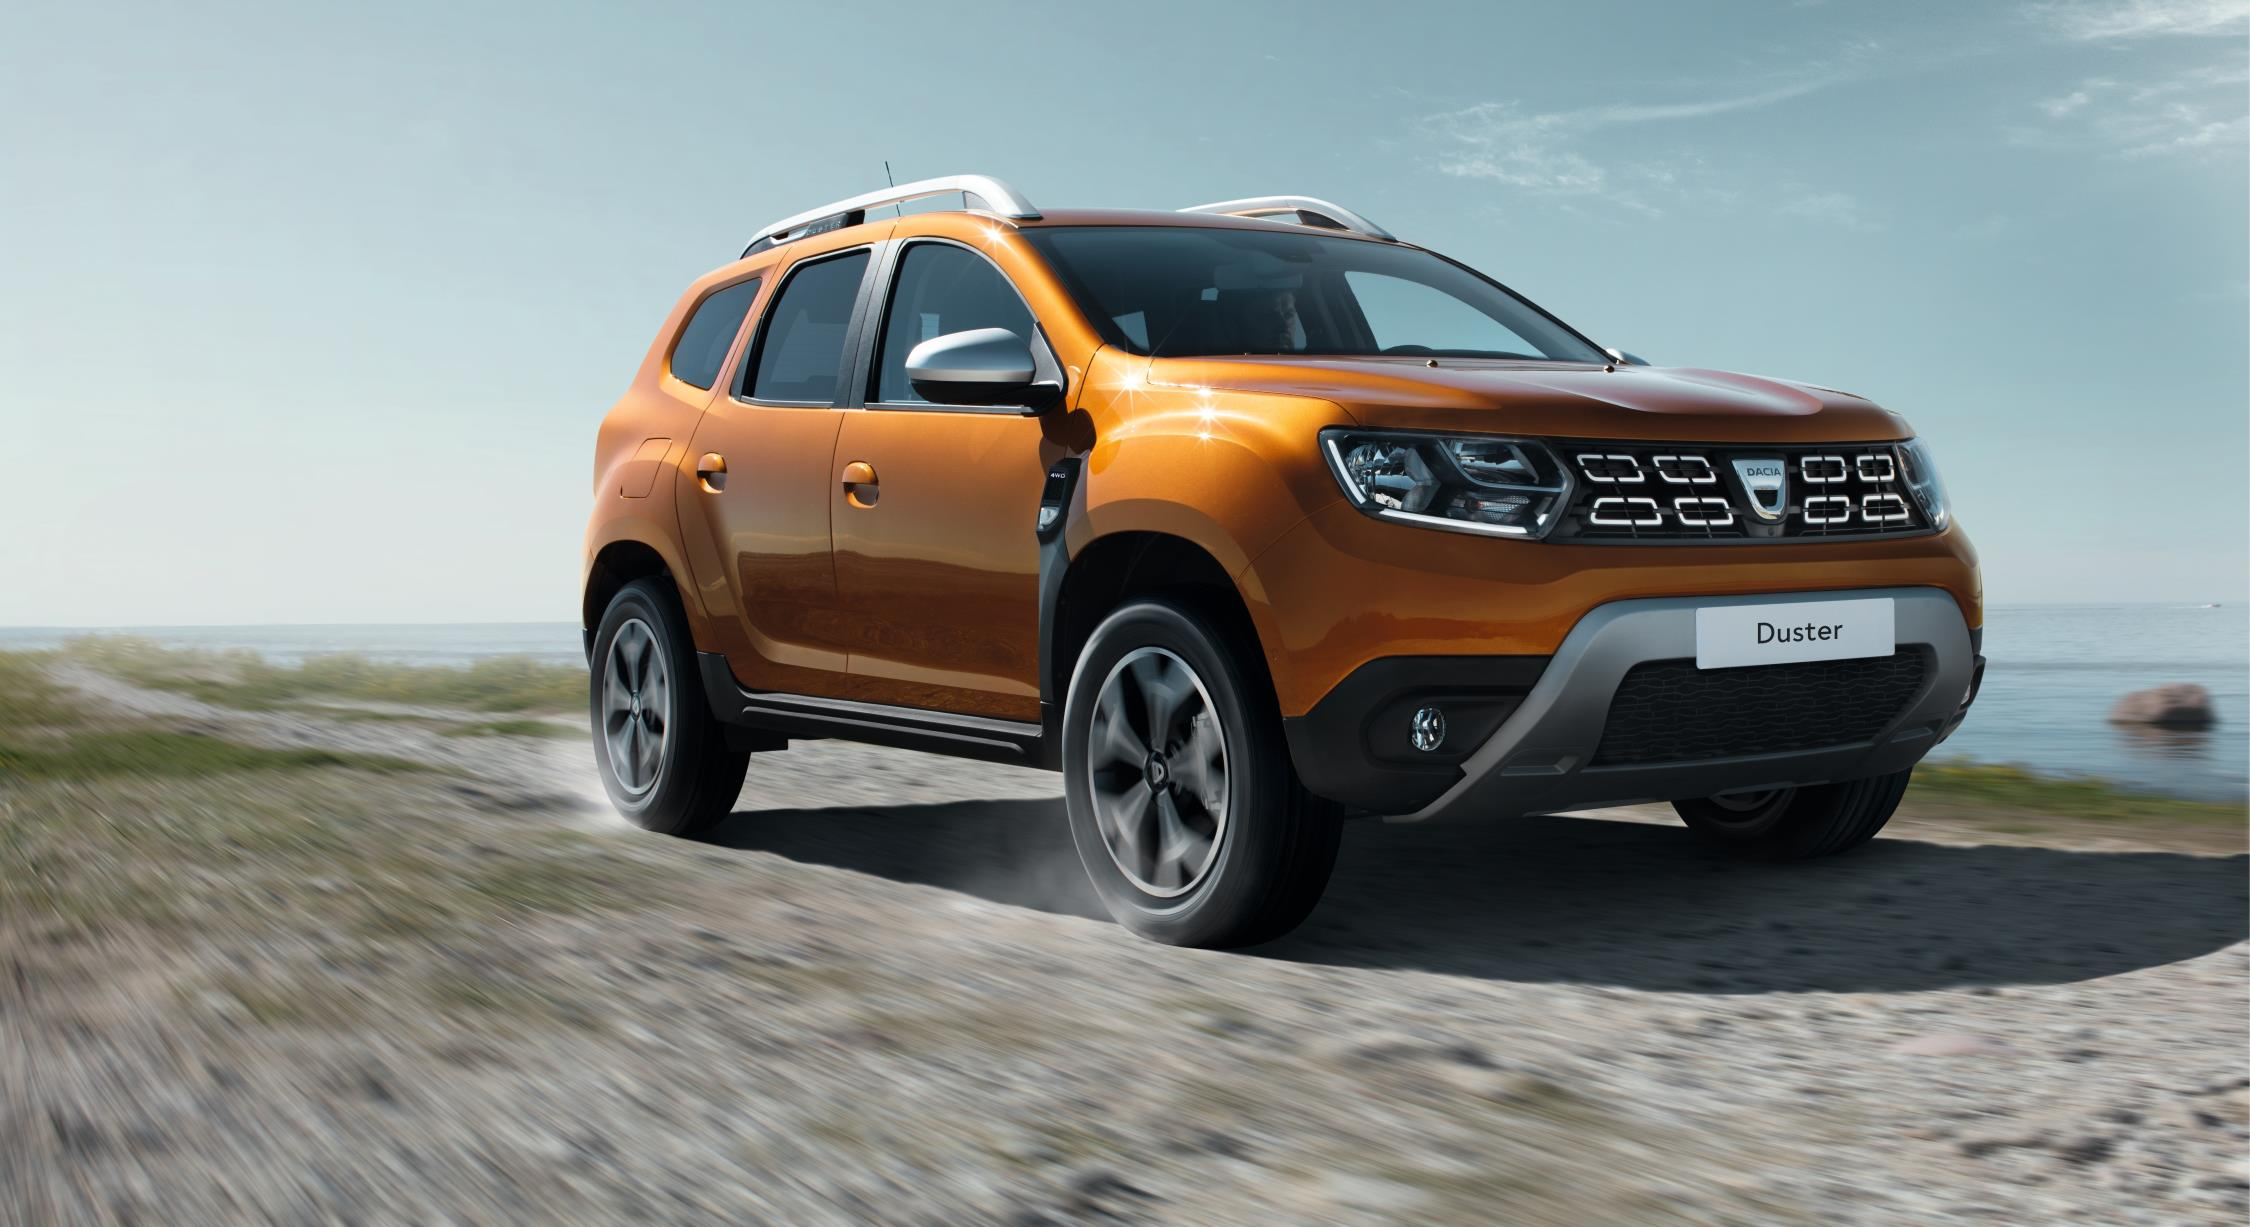 Dacia s EasyJet approach takes it to 5 million sales